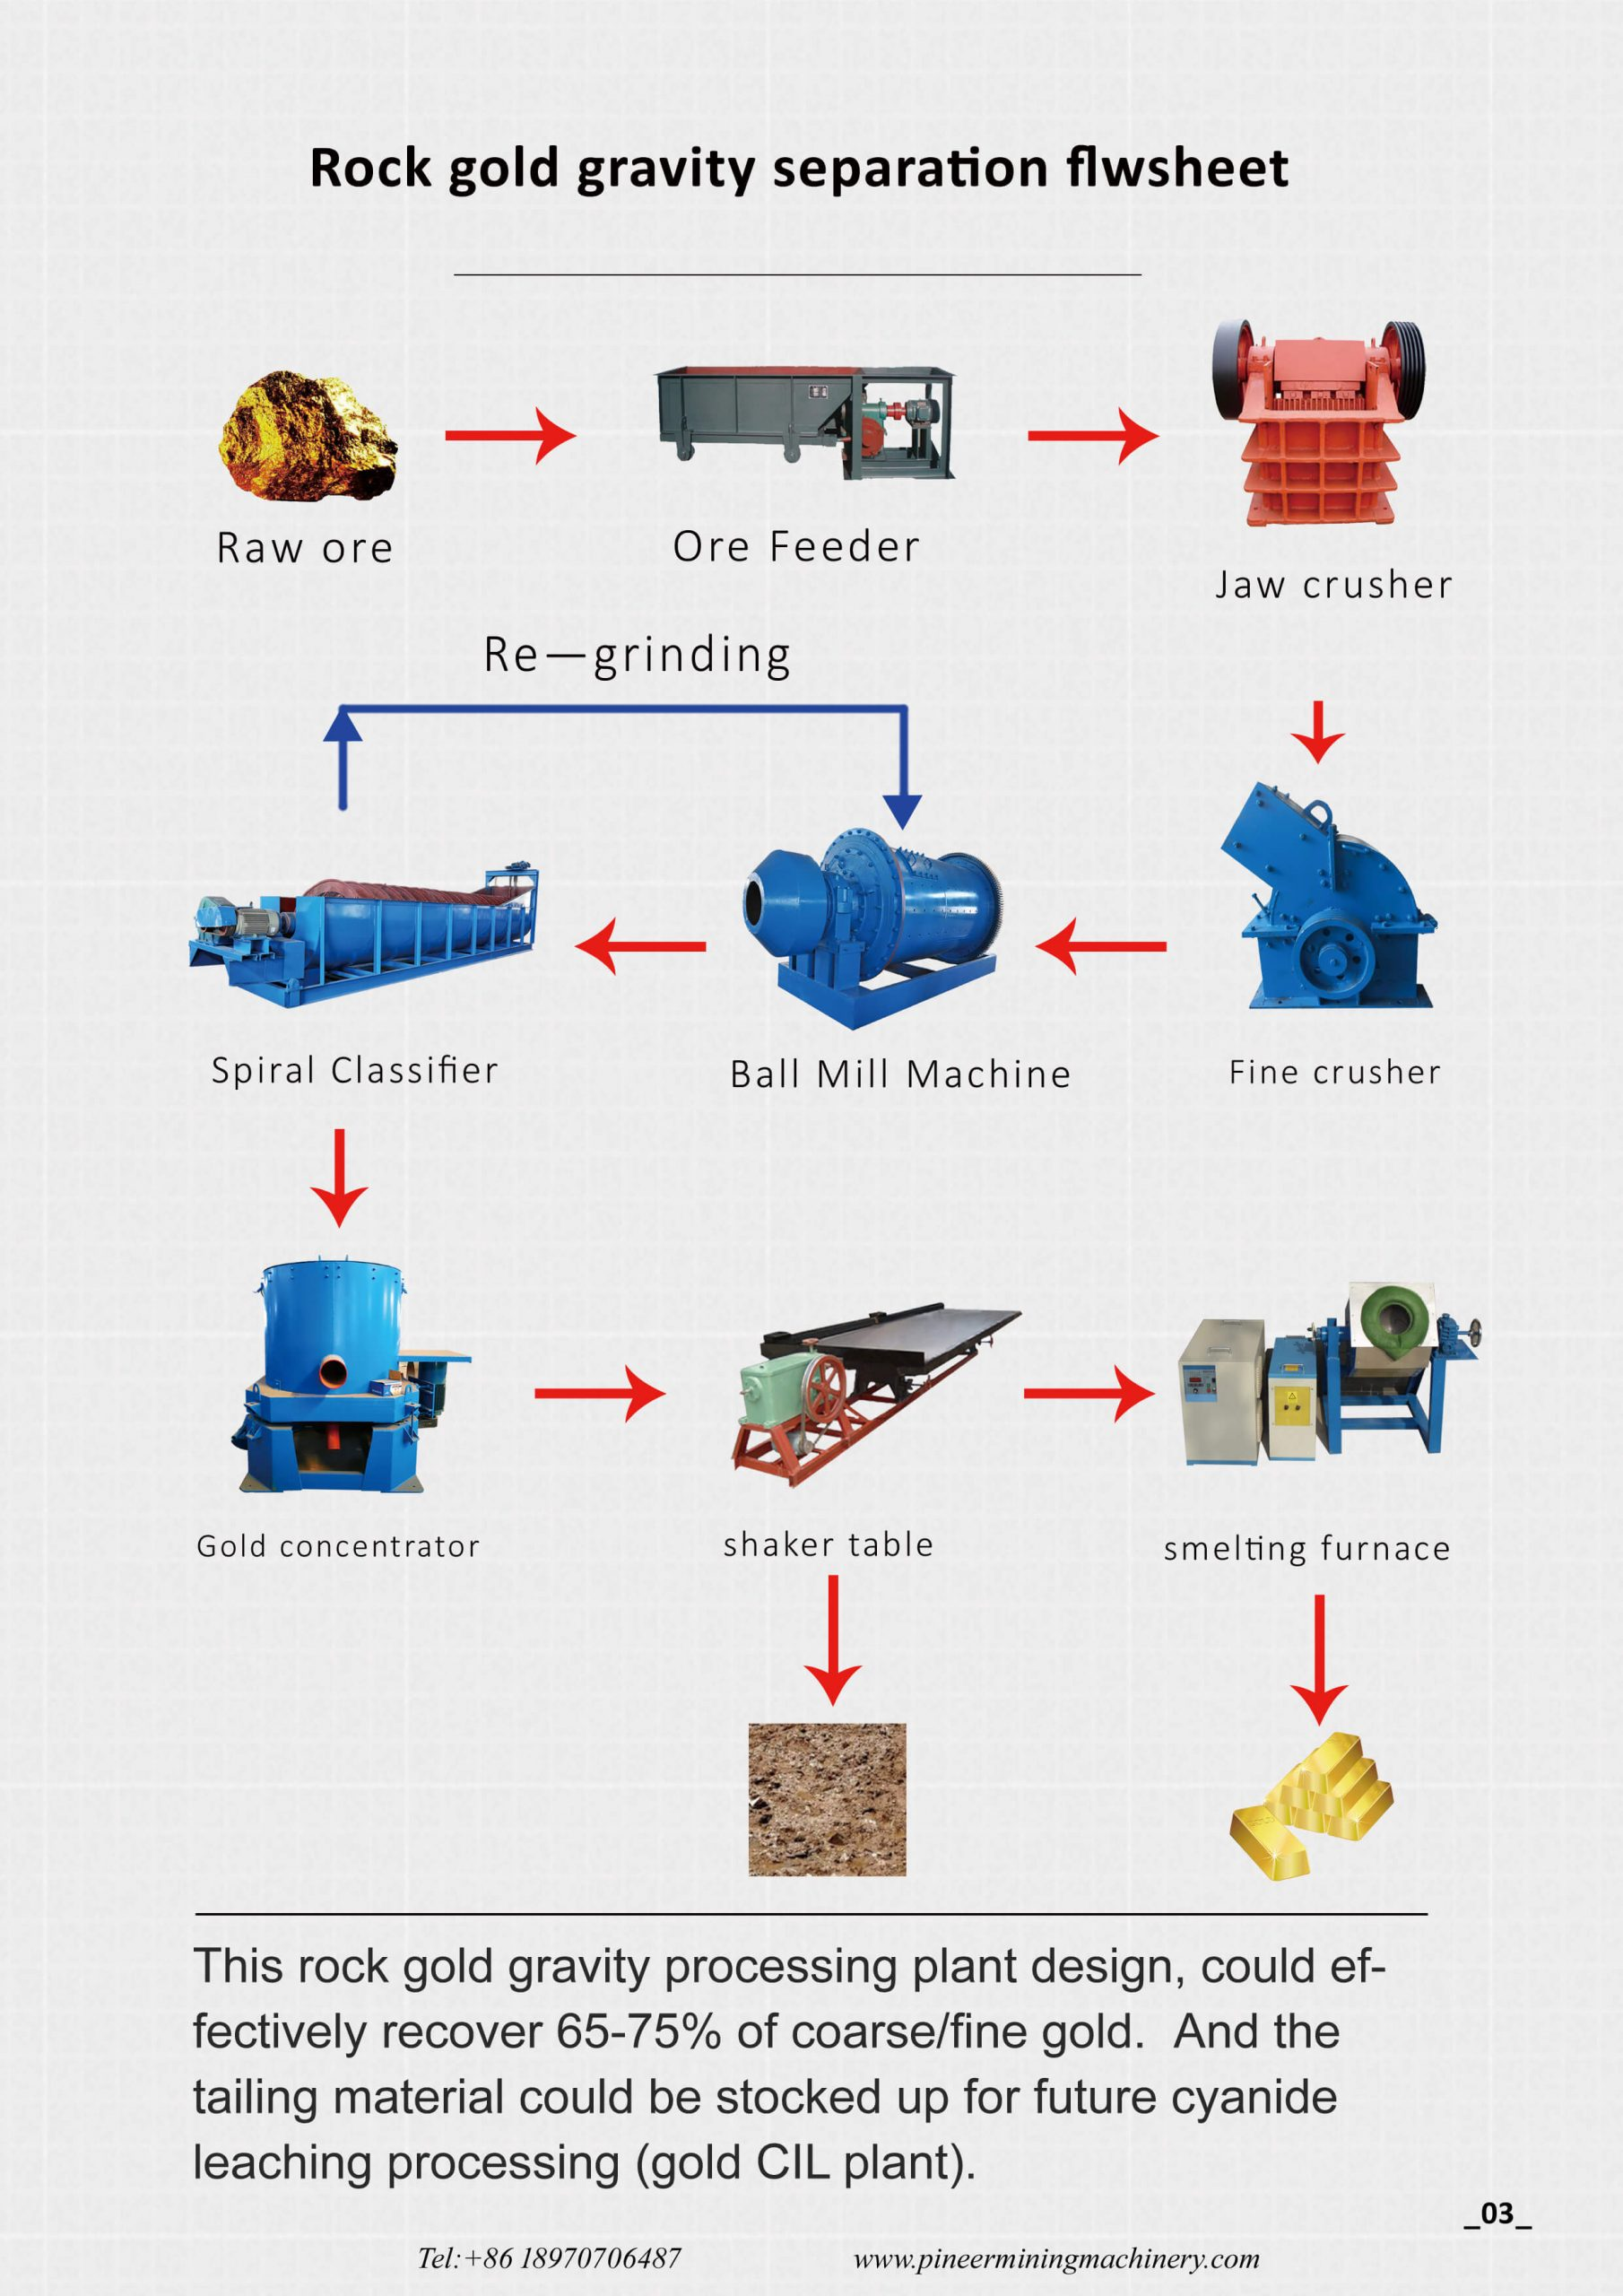 Rock gold processing plant design